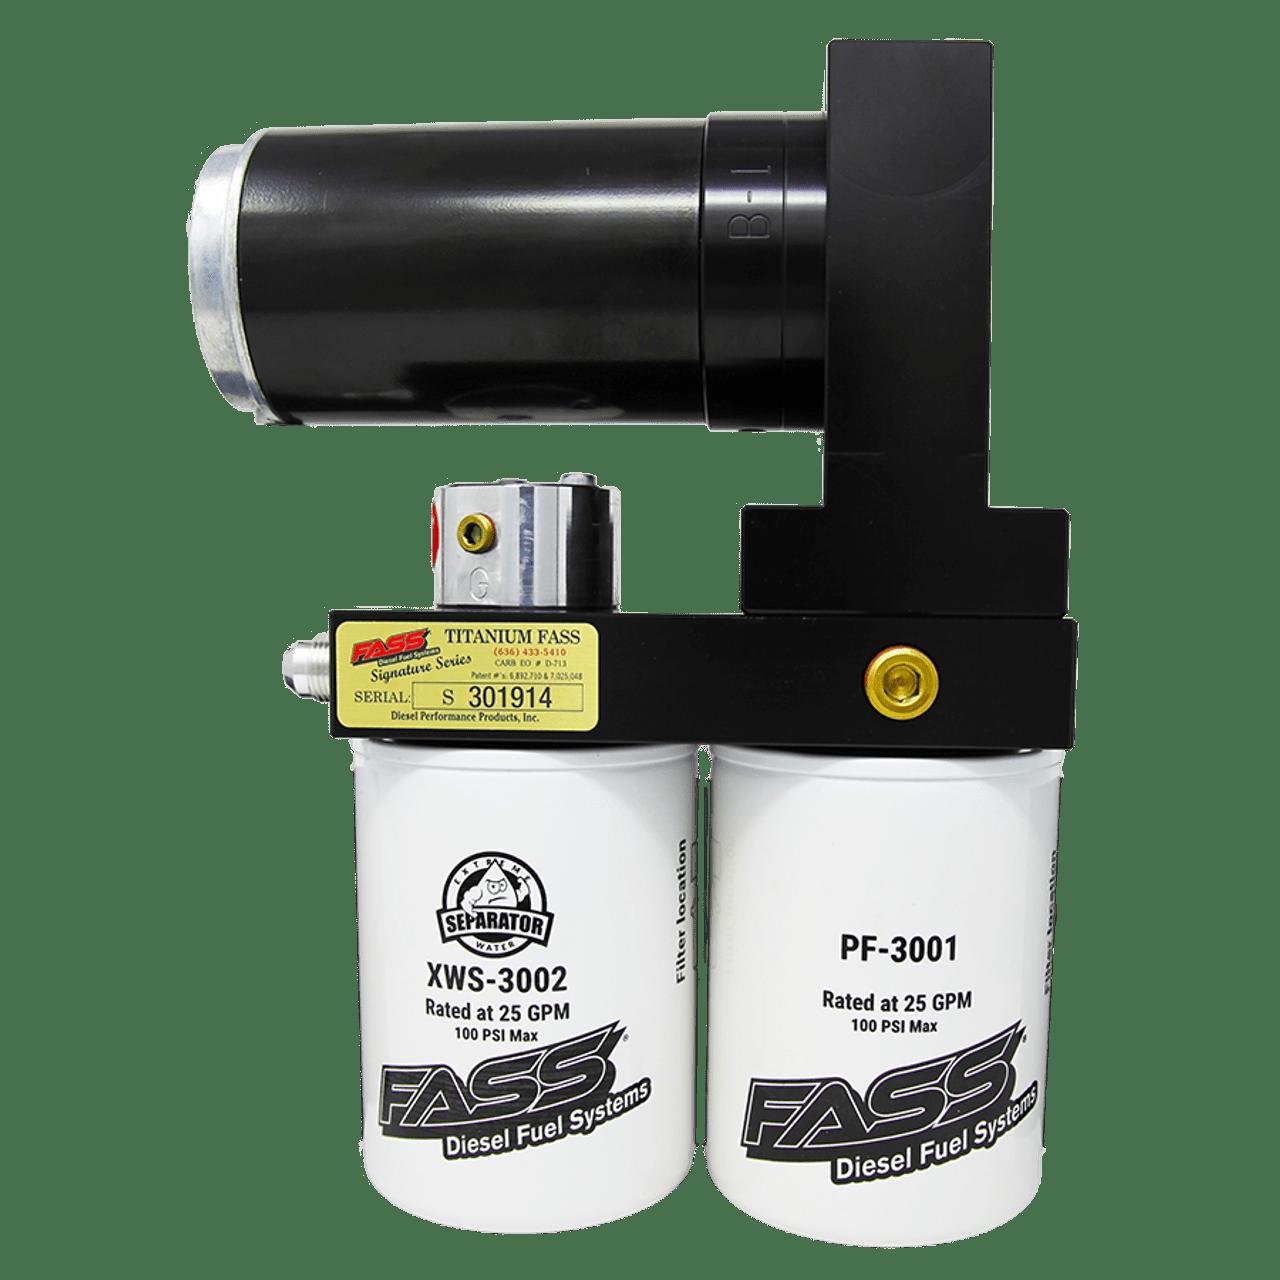 small resolution of 2011 duramax diesel fuel filter